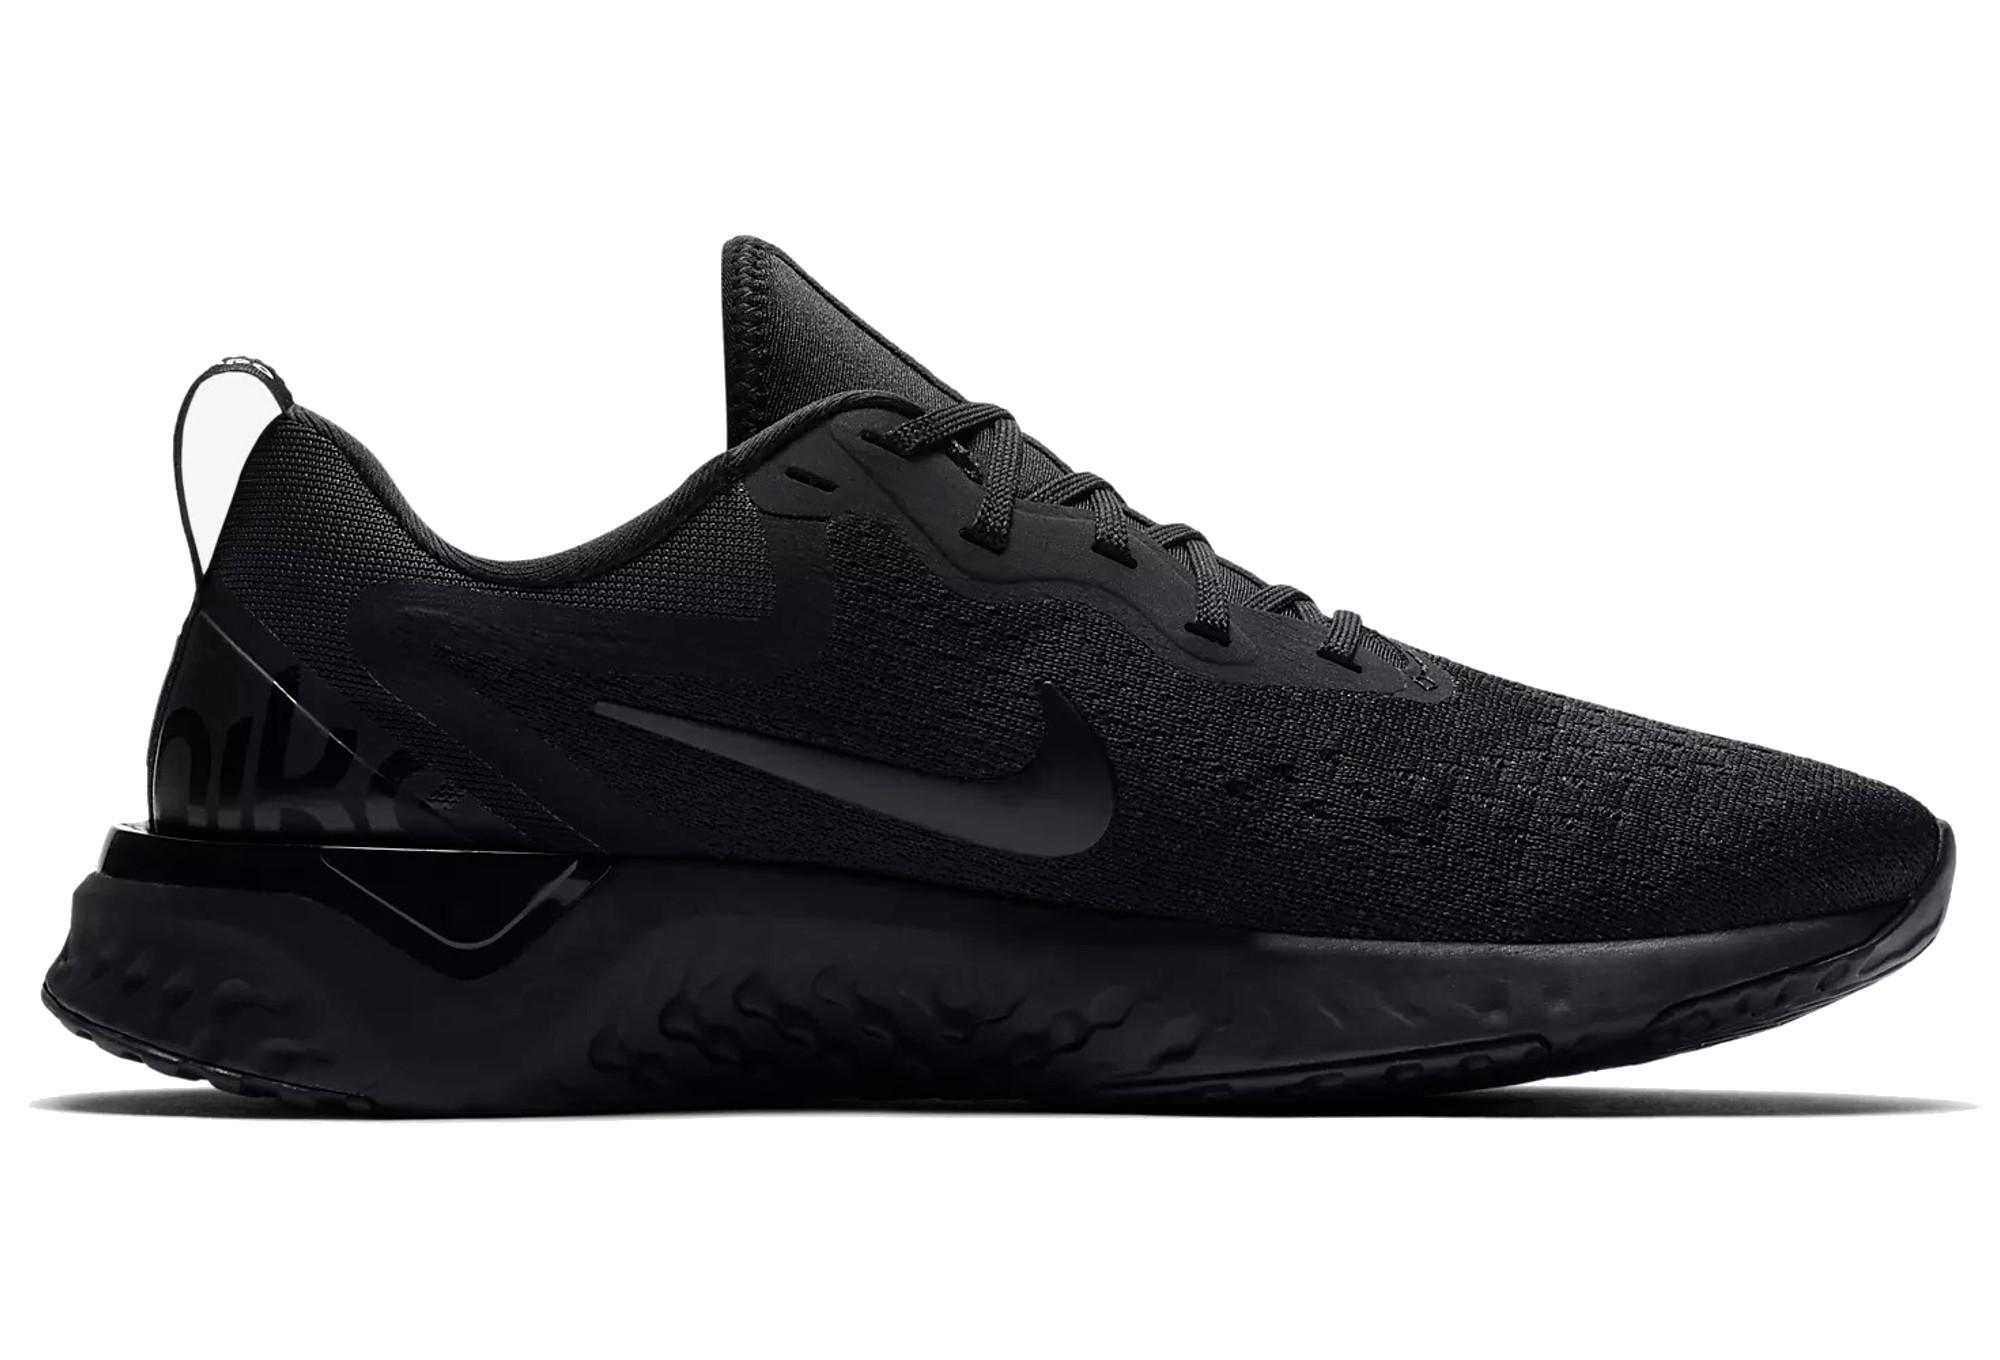 f74f2cd4830d Nike Shoes Odyssey React Black Men